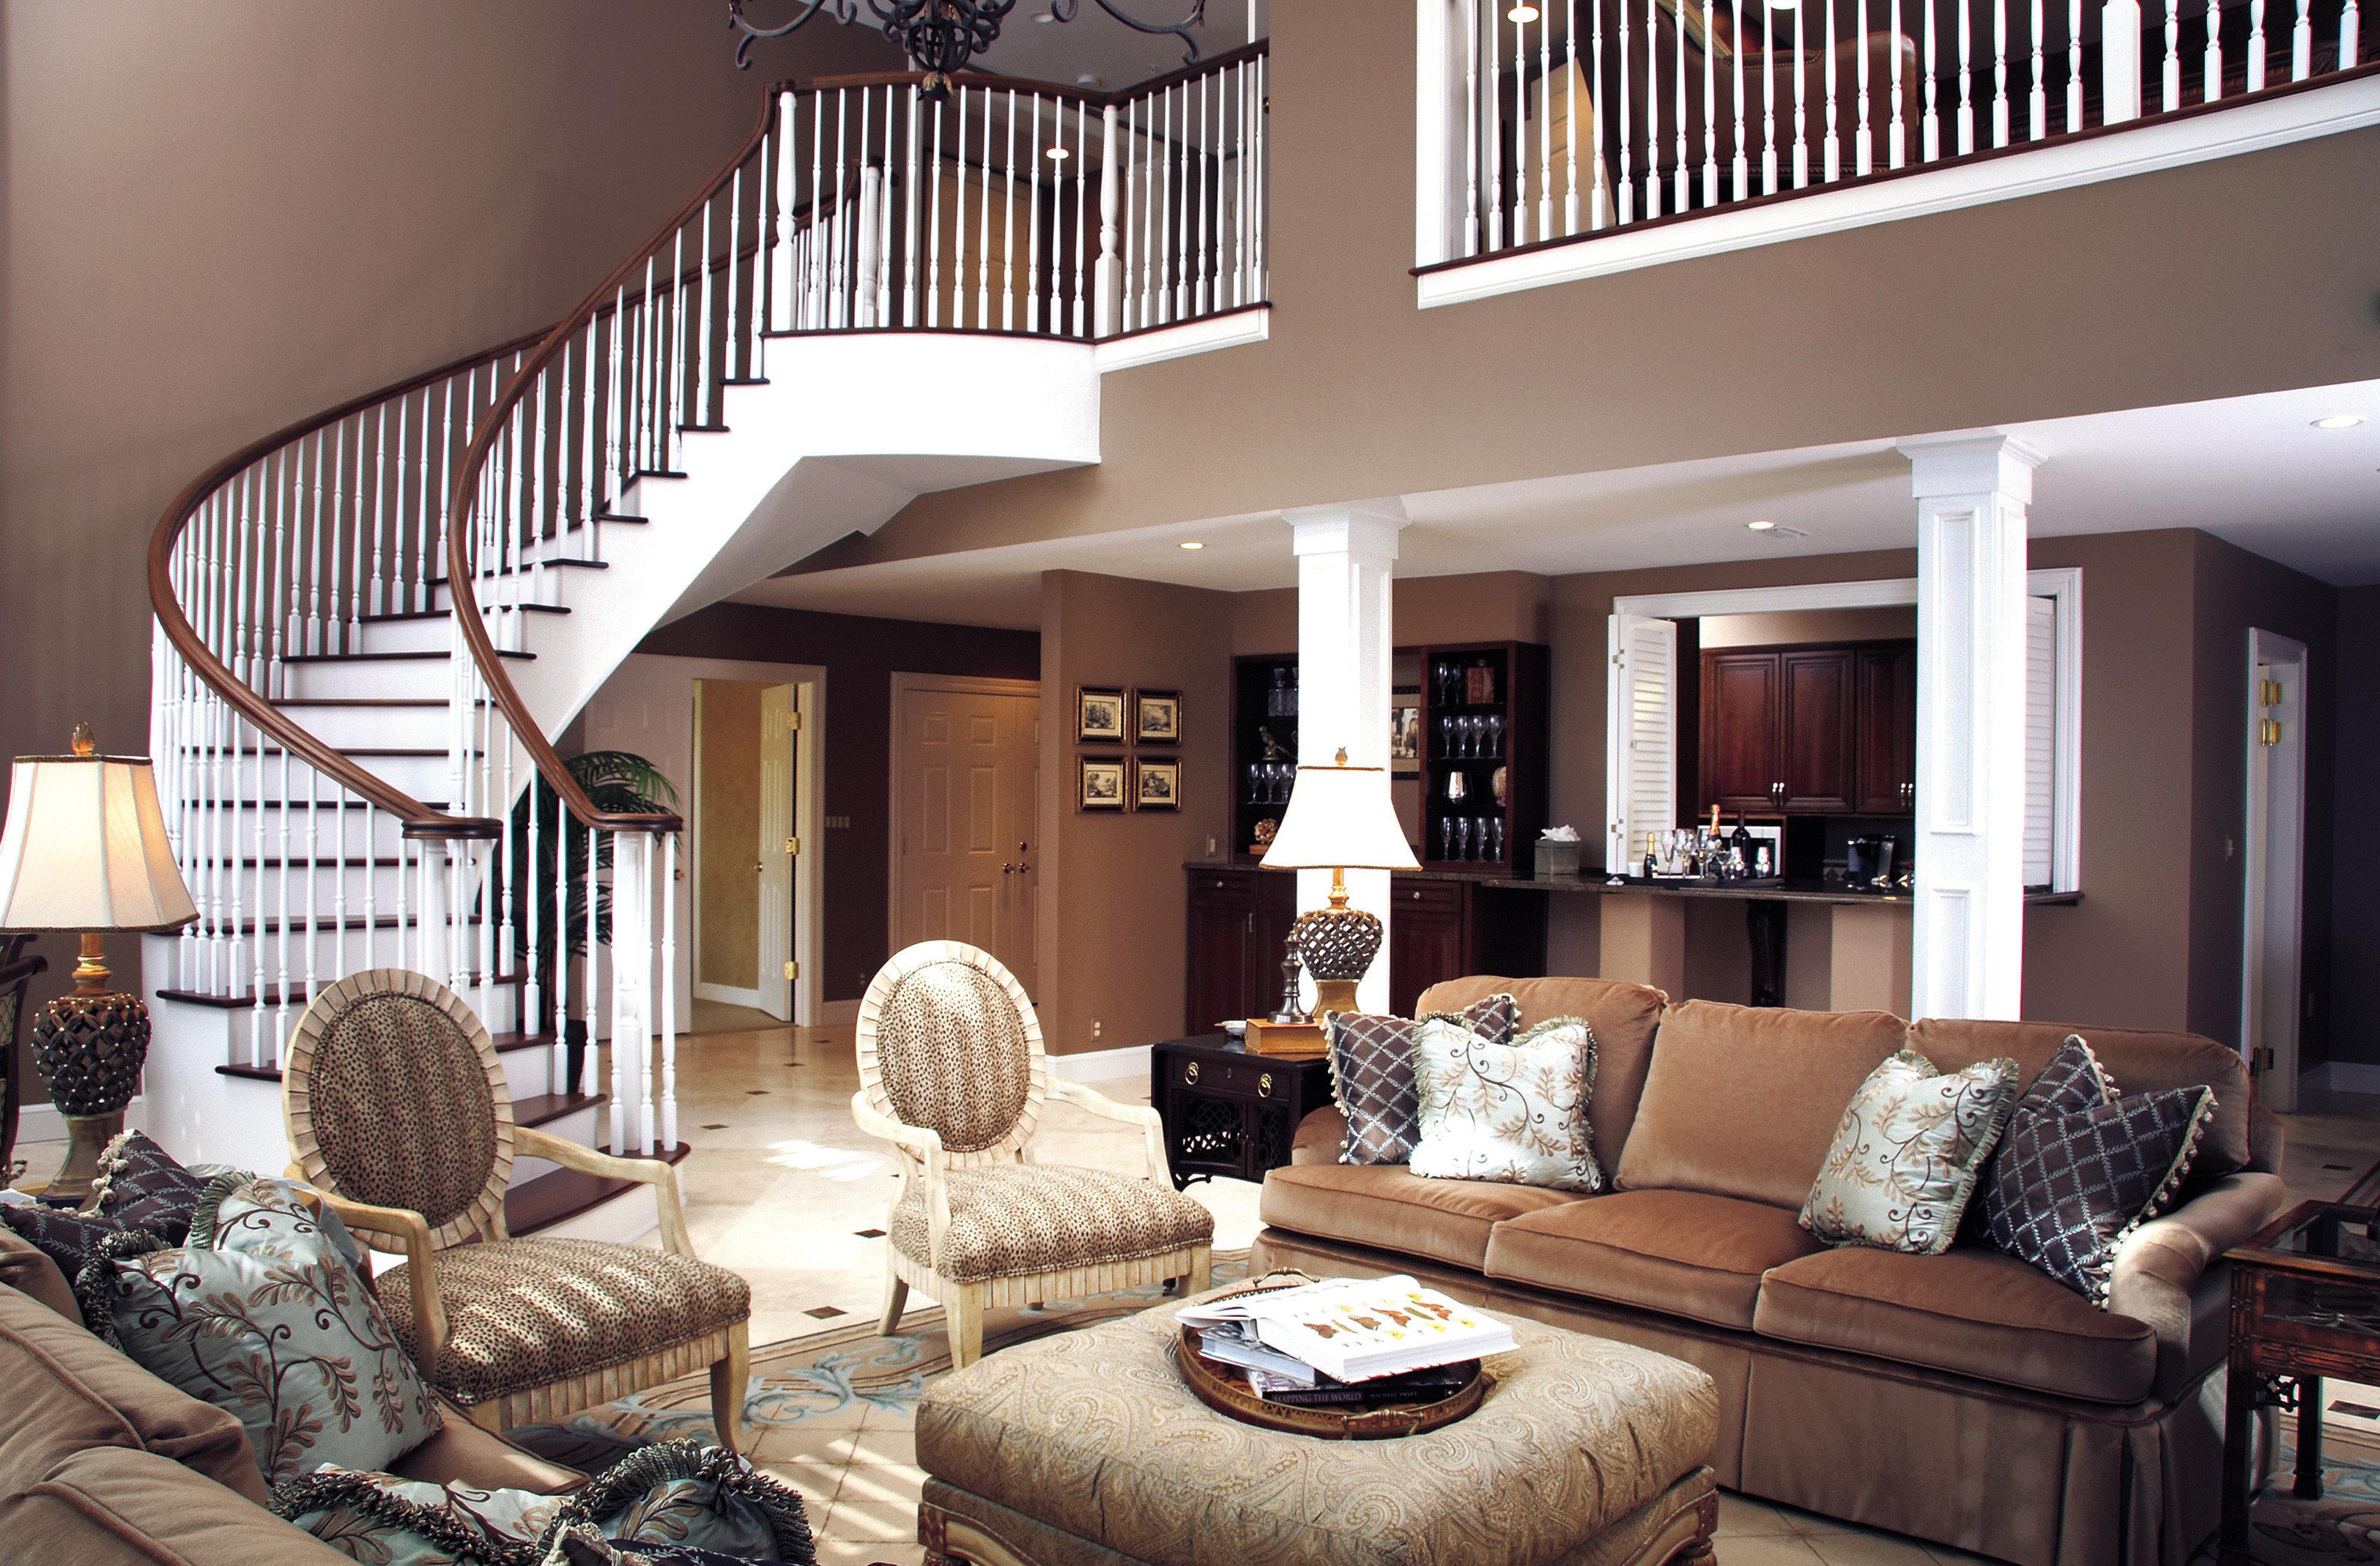 Lounge Luxury sofa living room property home condominium cottage Villa mansion farmhouse leather